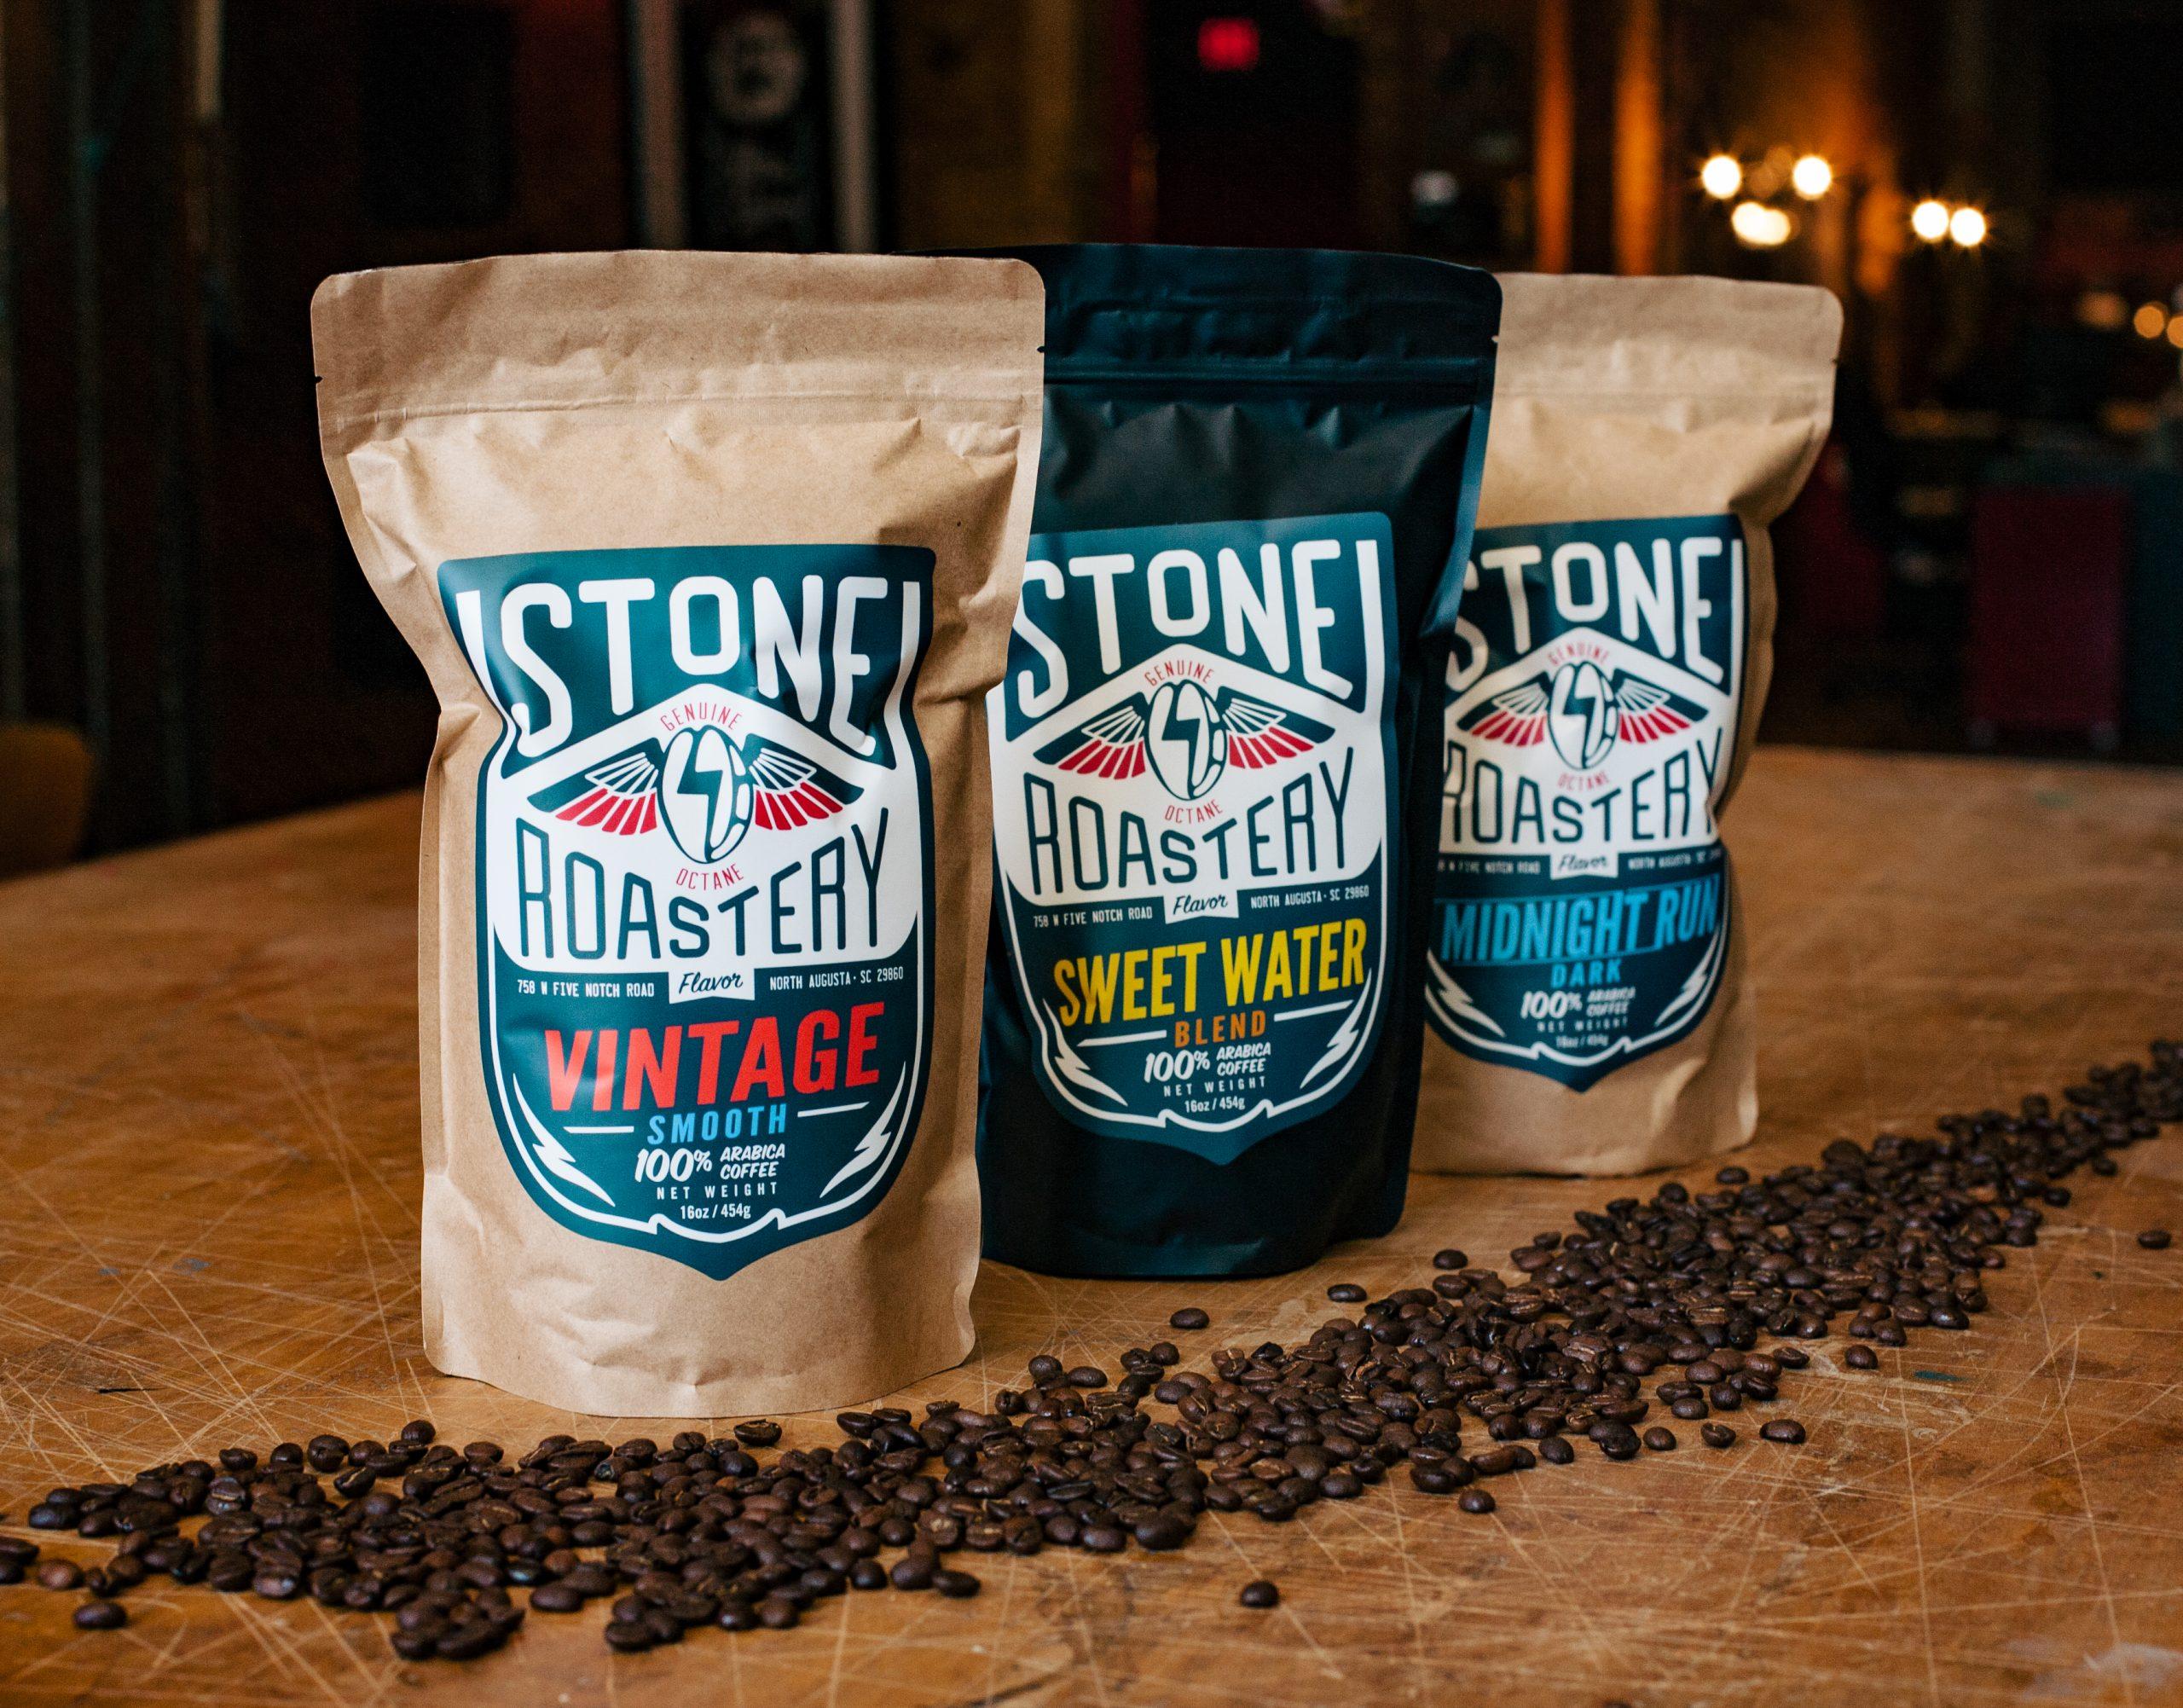 Stone Roastery Bags (Vintage, Sweet Water, Midnight Run)